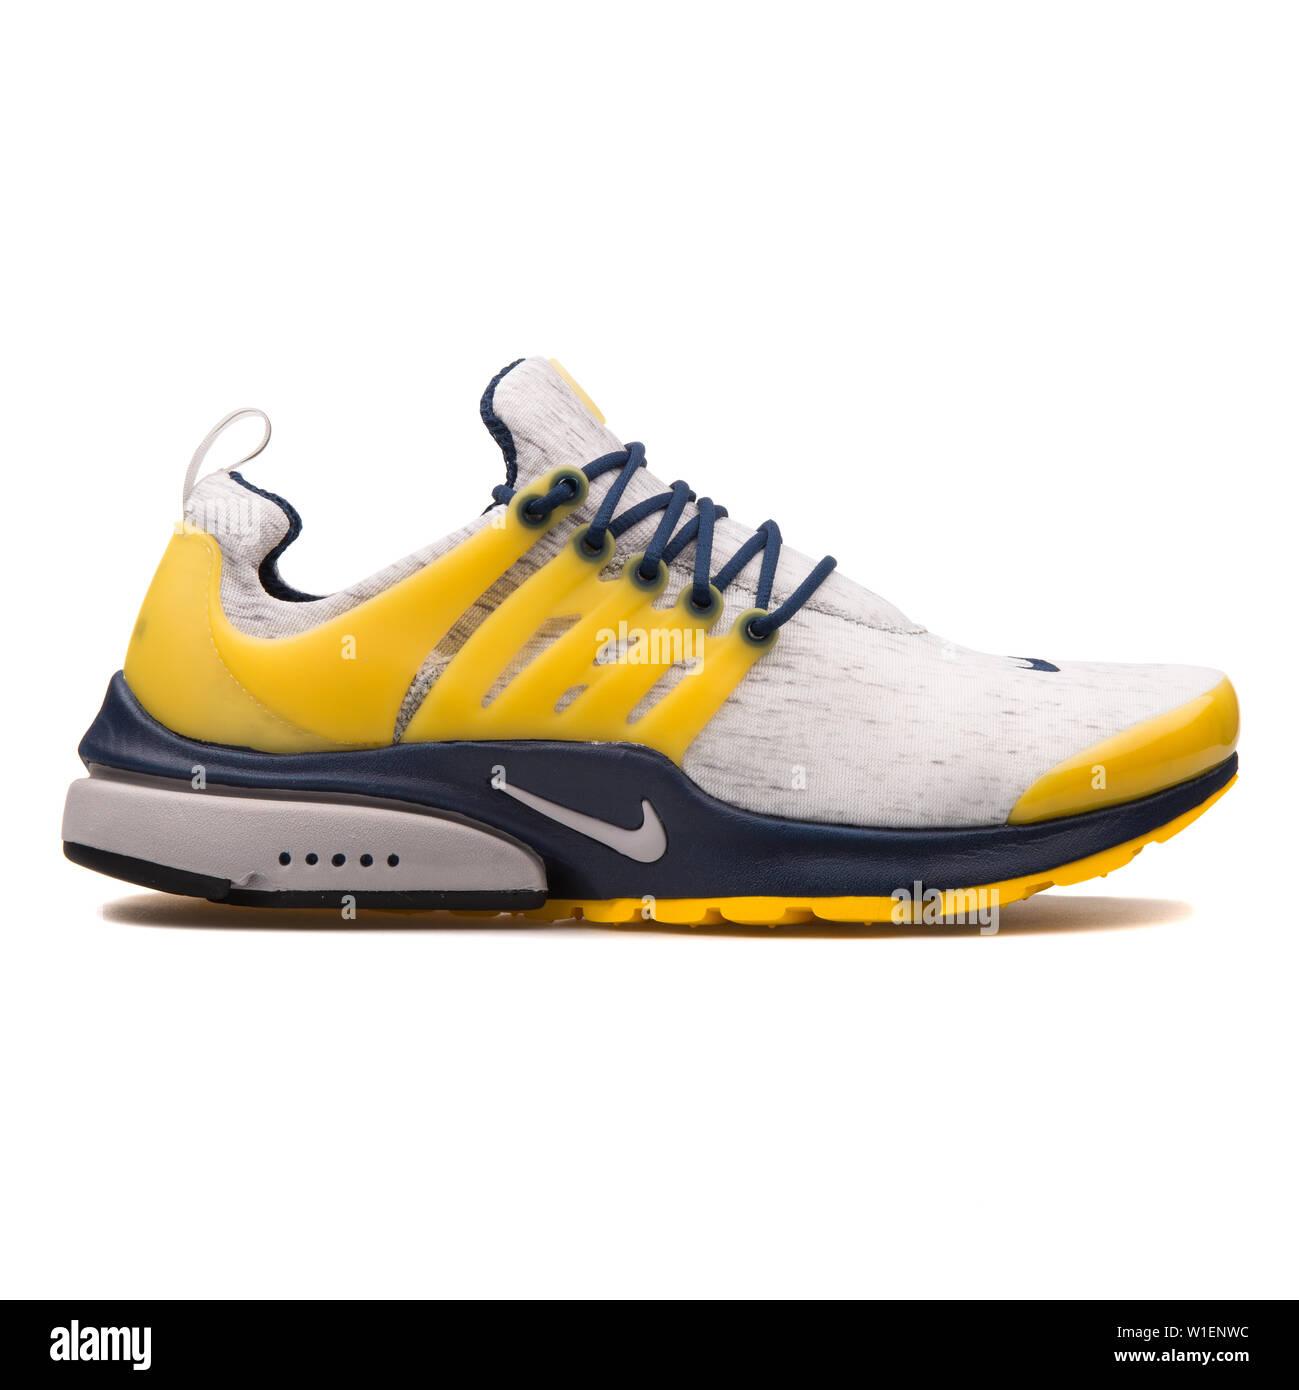 2017: Nike Air Presto grey, navy blue